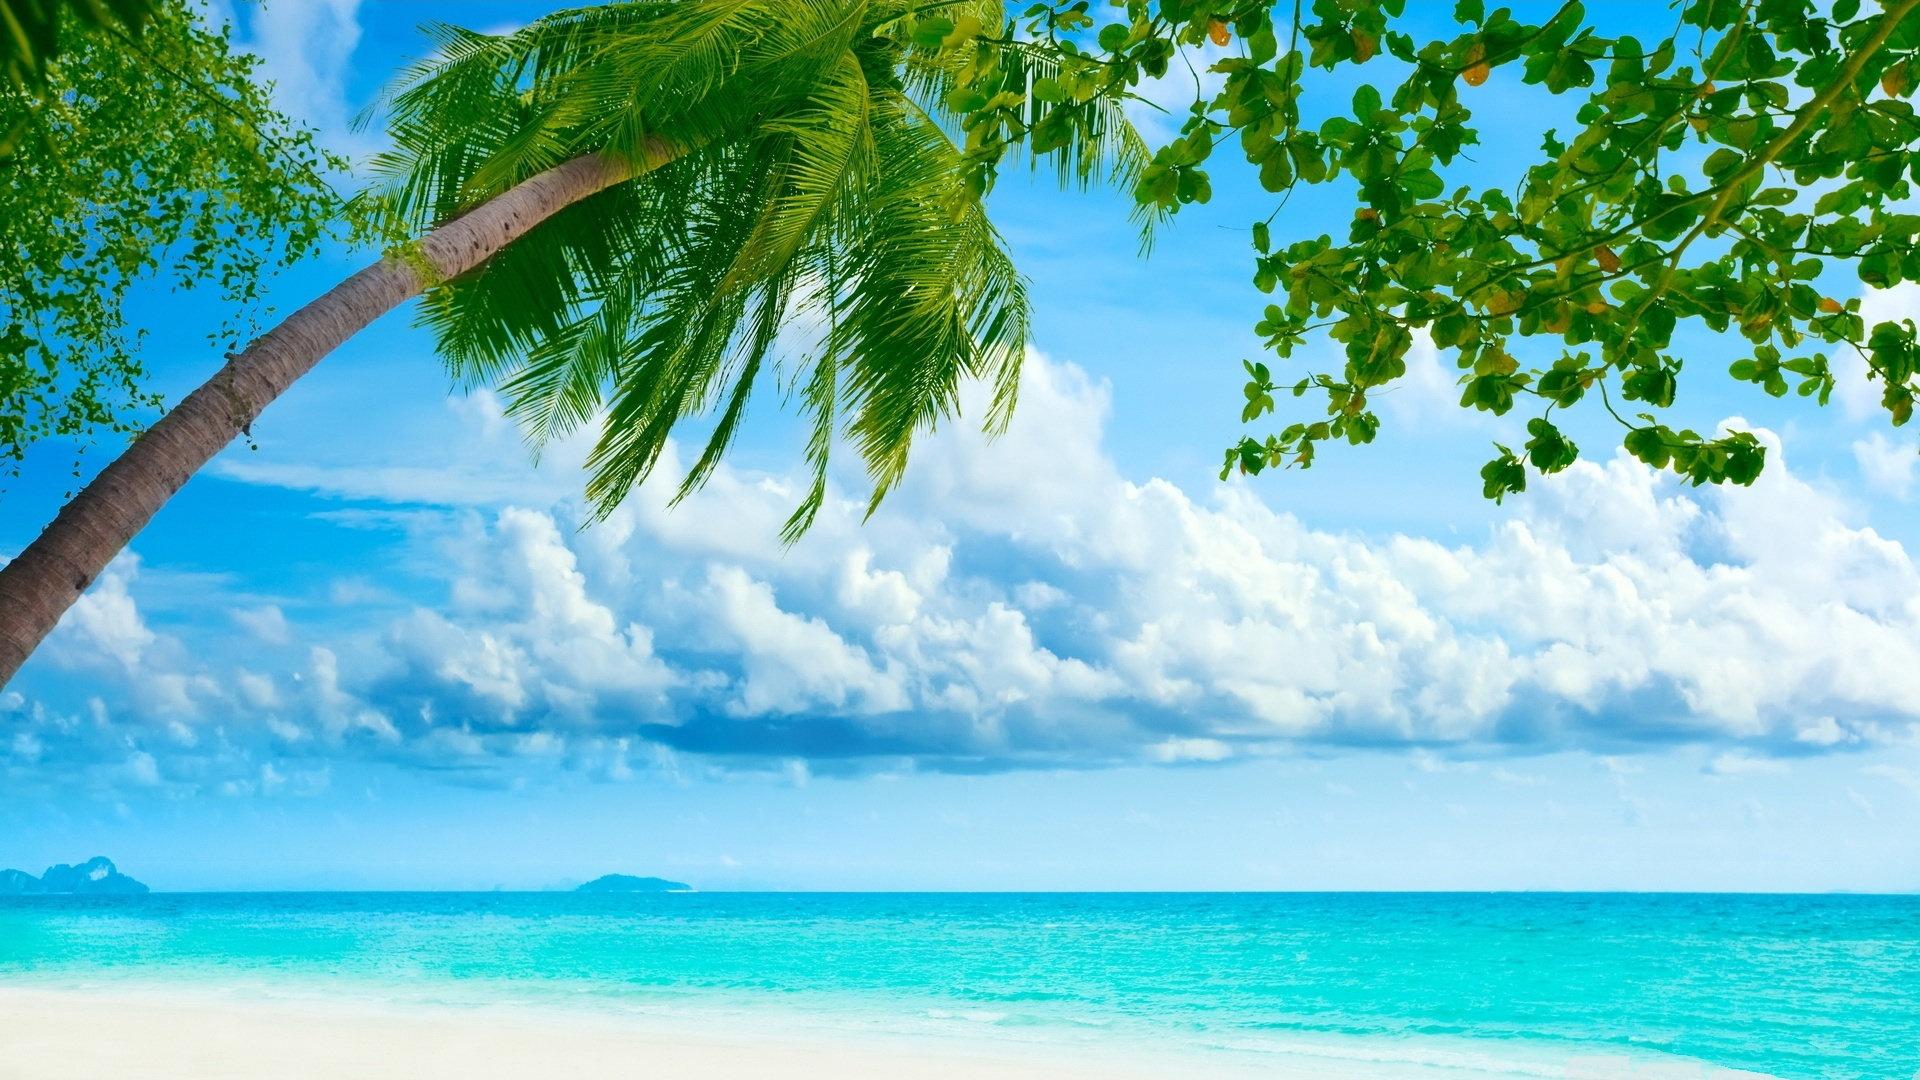 Tropical Island Desktop Wallpaper   1920x1080 1920x1080